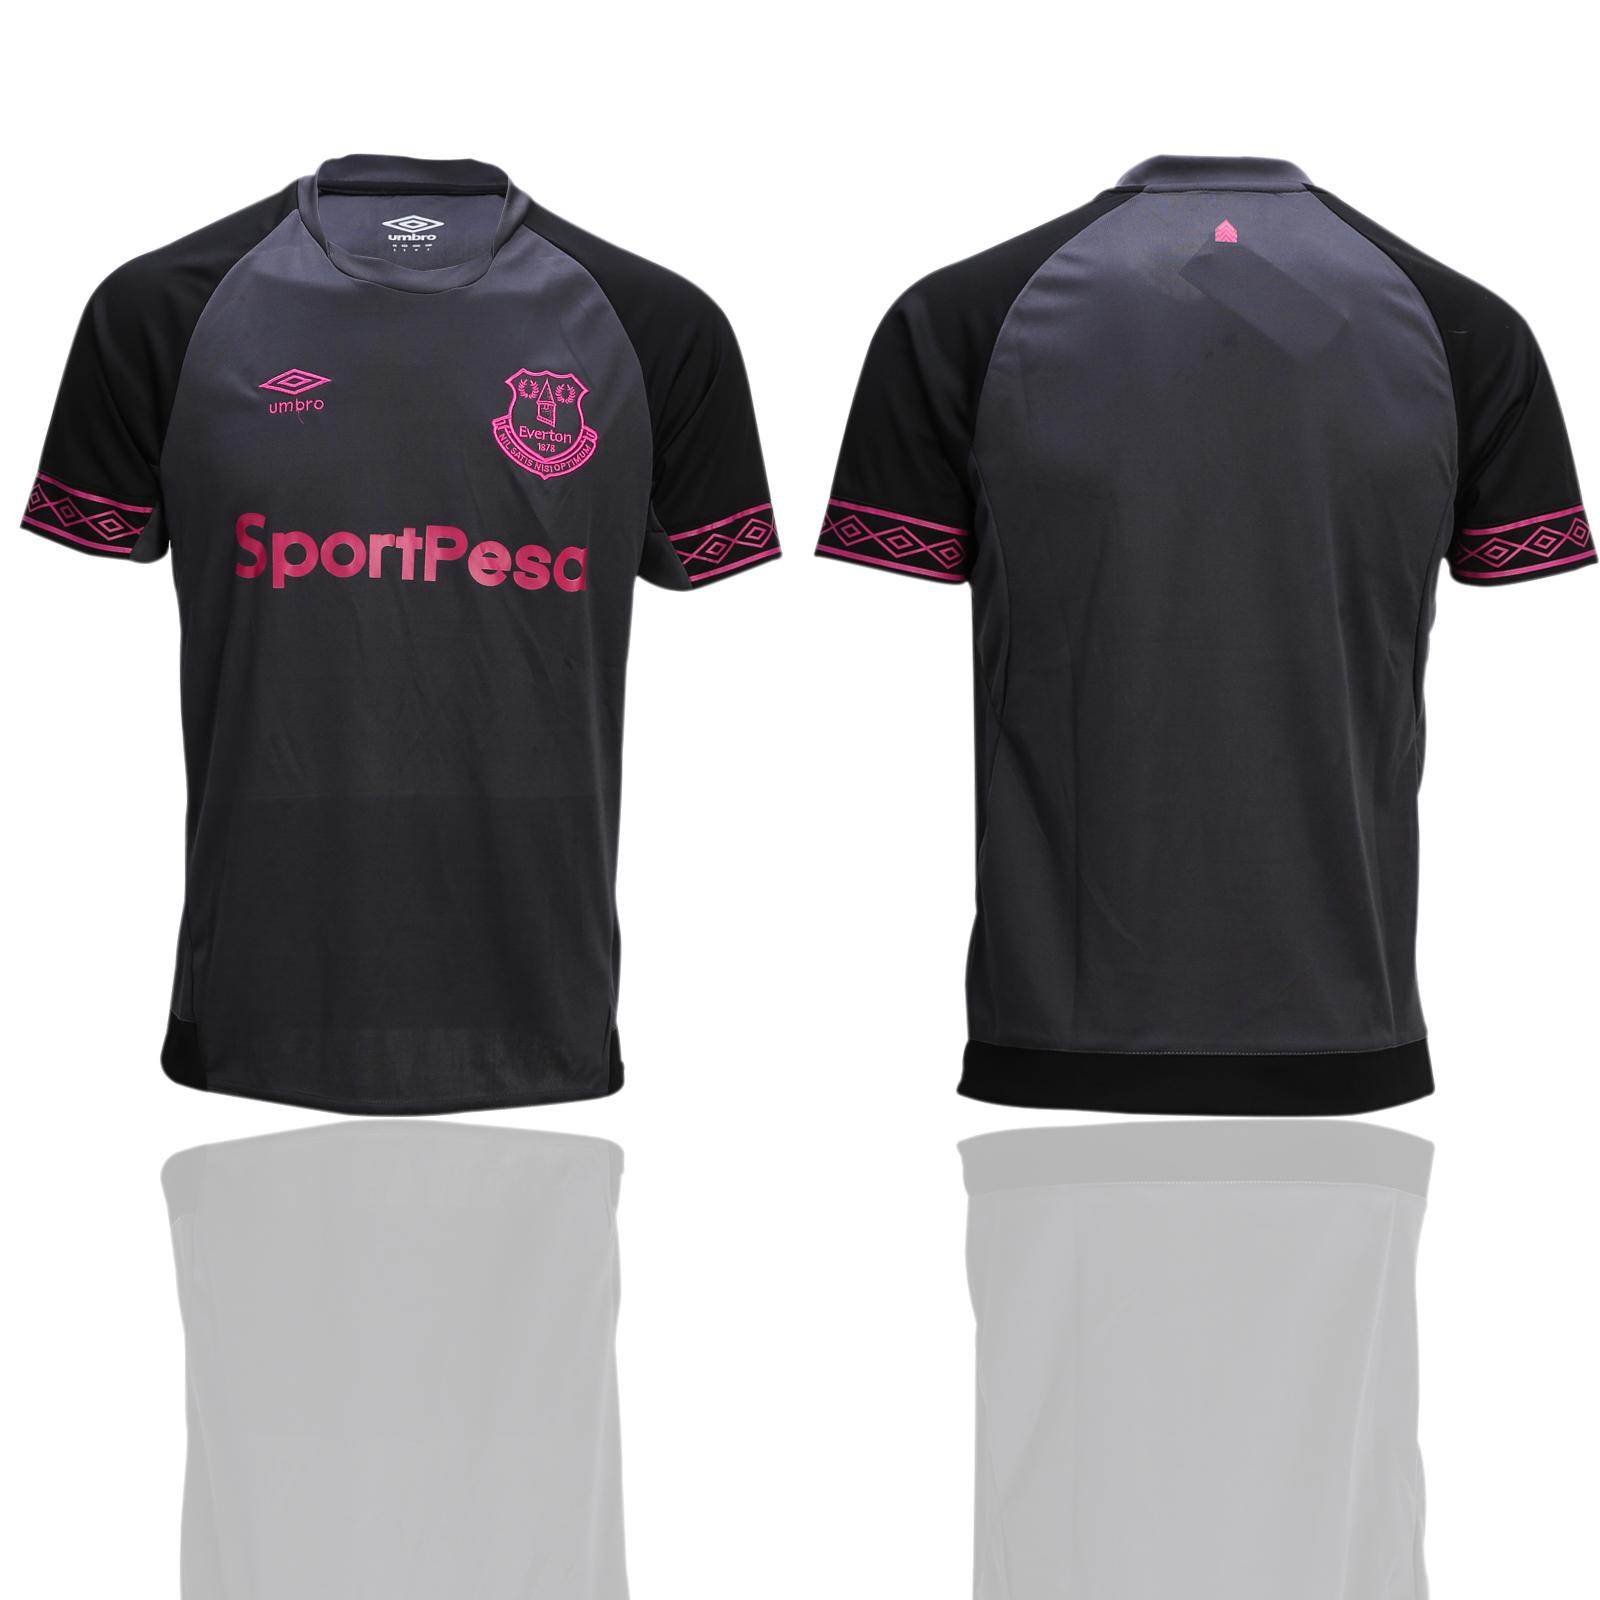 2018-19 Everton Away Thailand Soccer Jersey